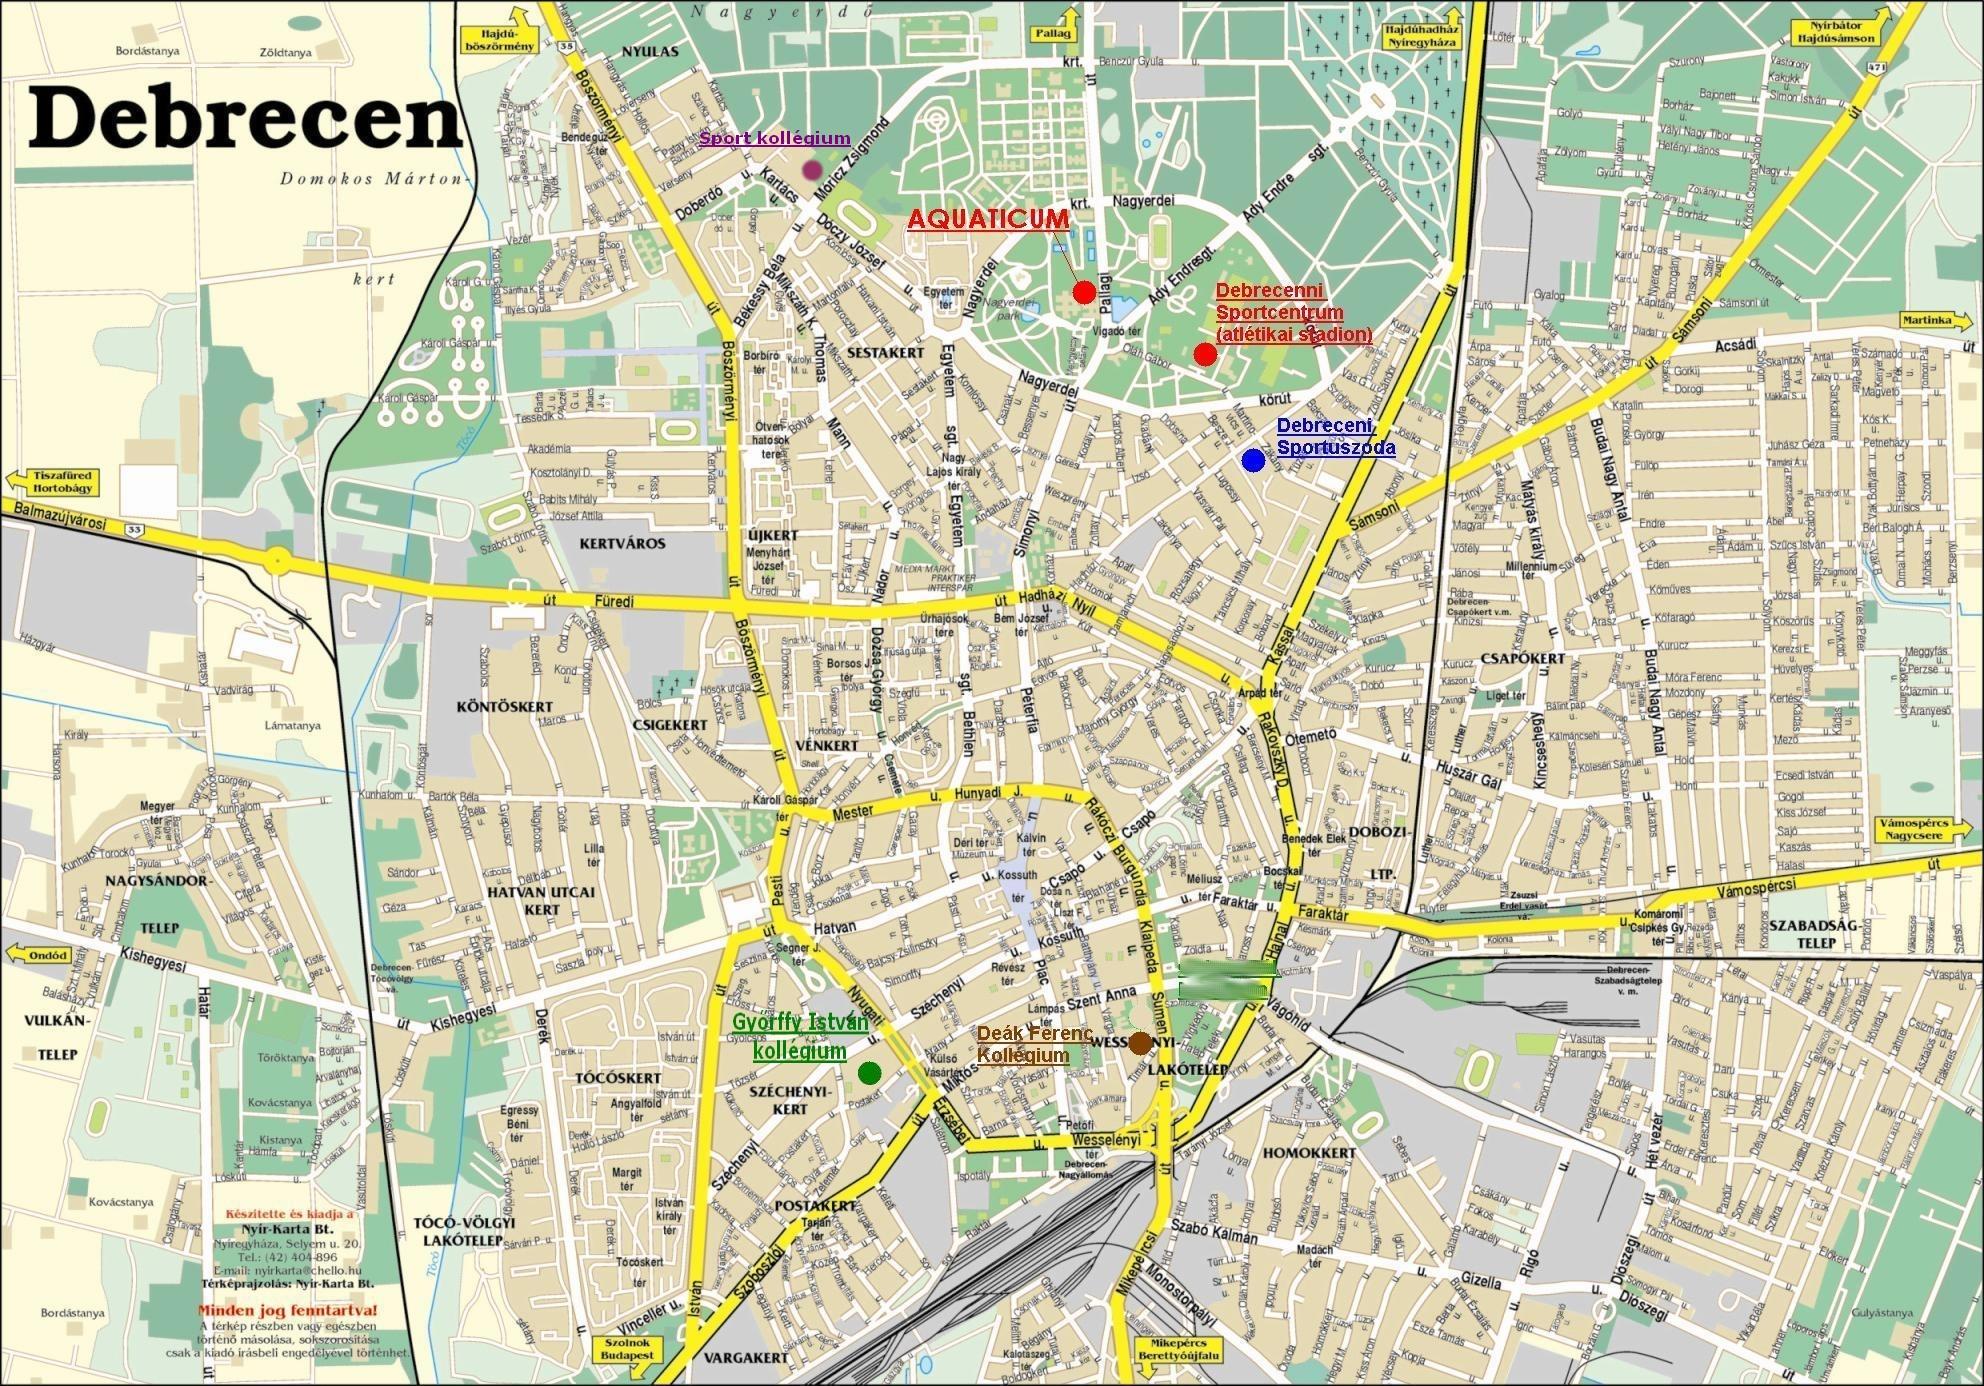 www debrecen térkép terkep www debrecen térkép